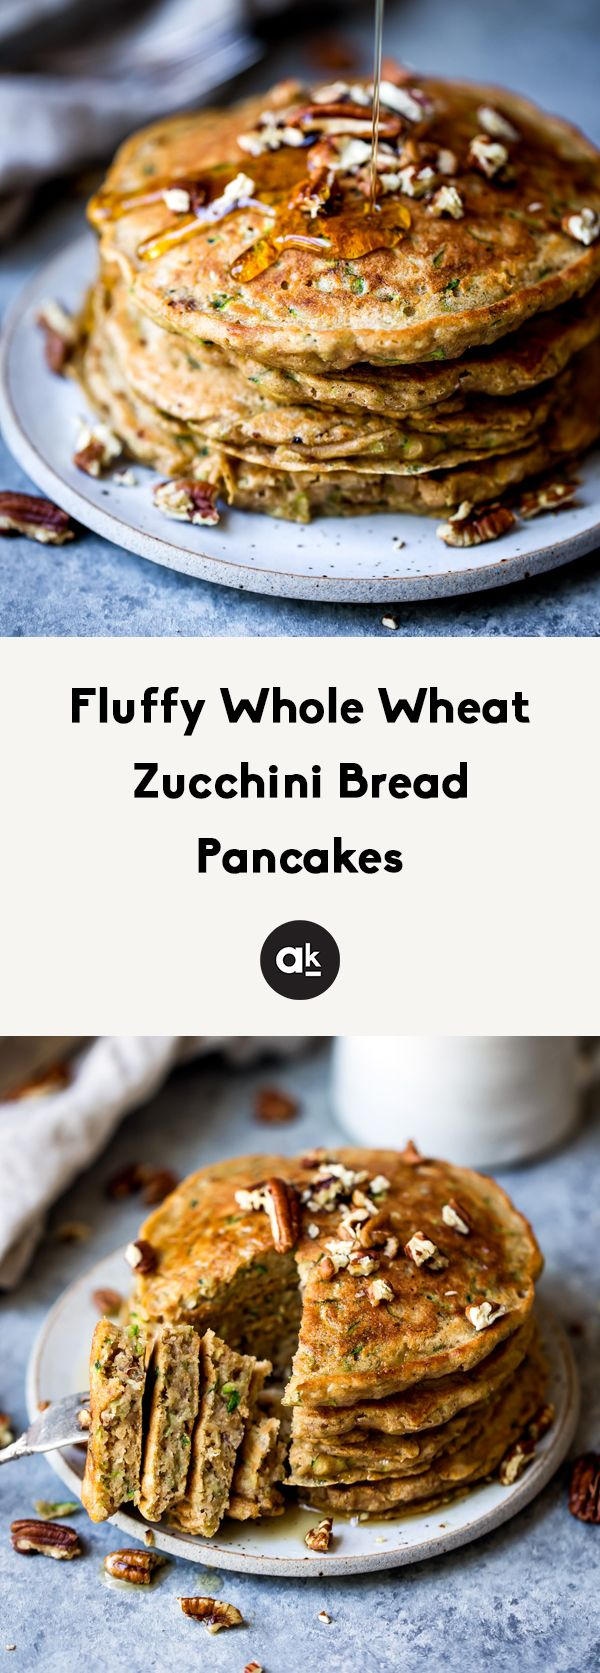 fluffy whole wheat zucchini bread pancakes  recipe